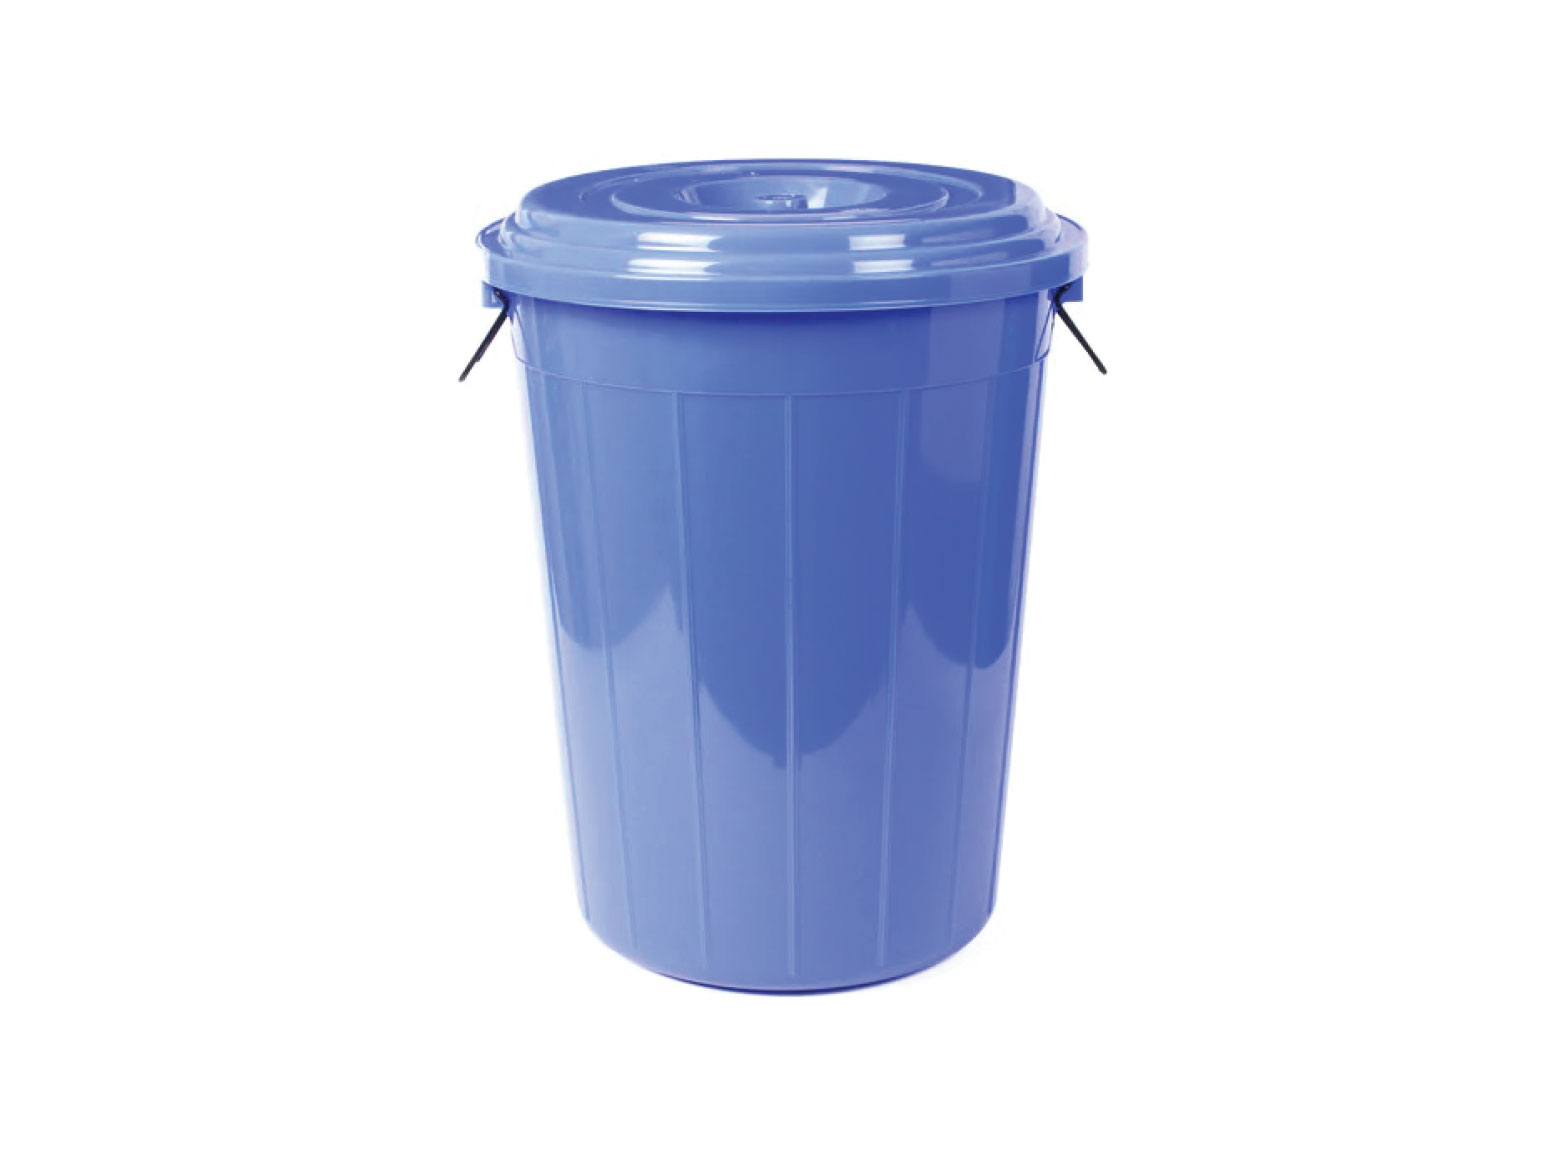 Plastic Drum with Lid